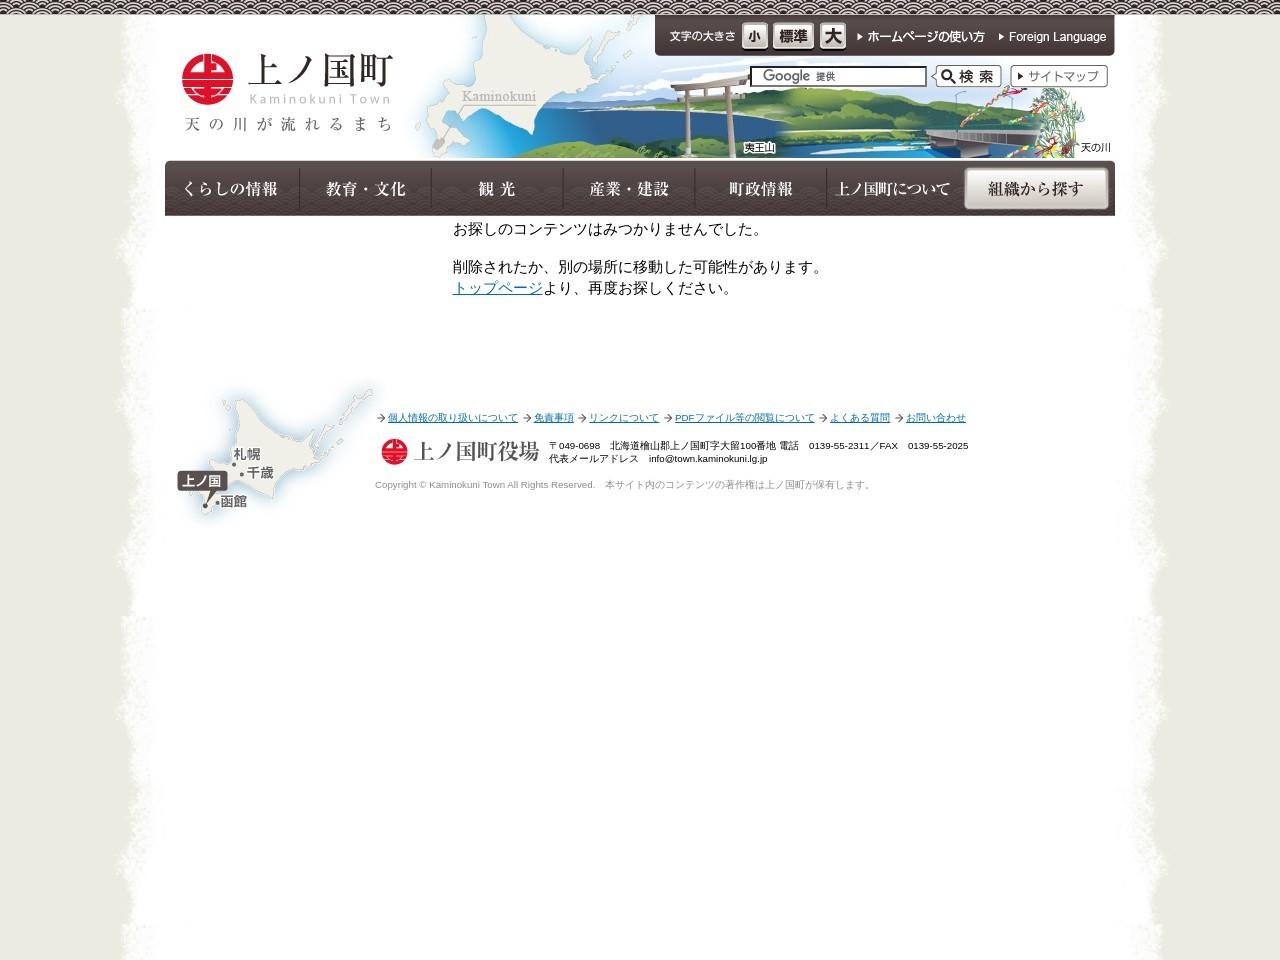 http://www.town.kaminokuni.lg.jp/hotnews/detail/00000287.html